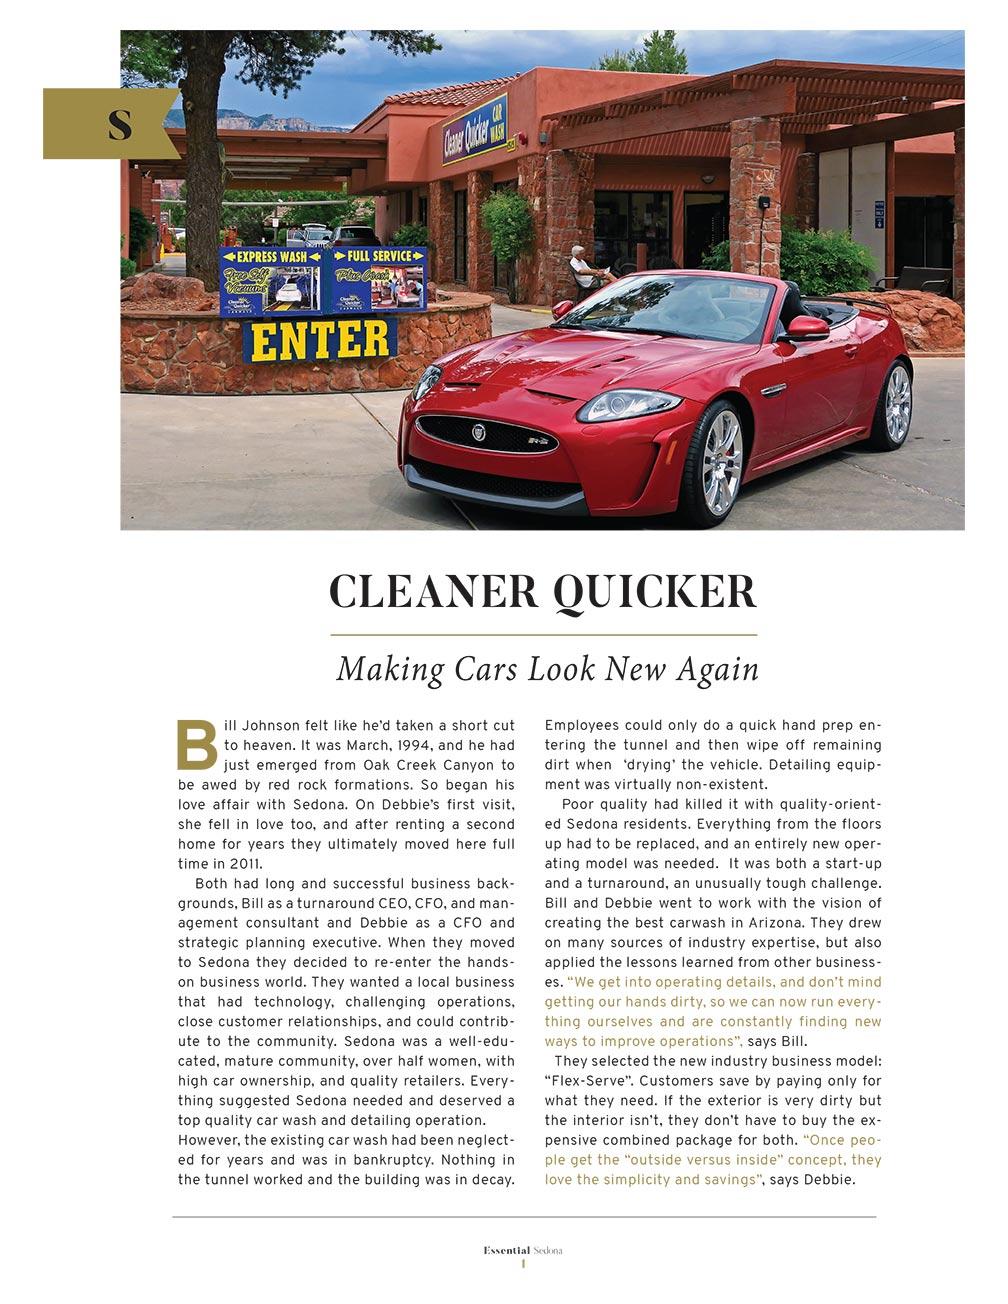 1-essential-sedona-making-cars-look-new-again-1